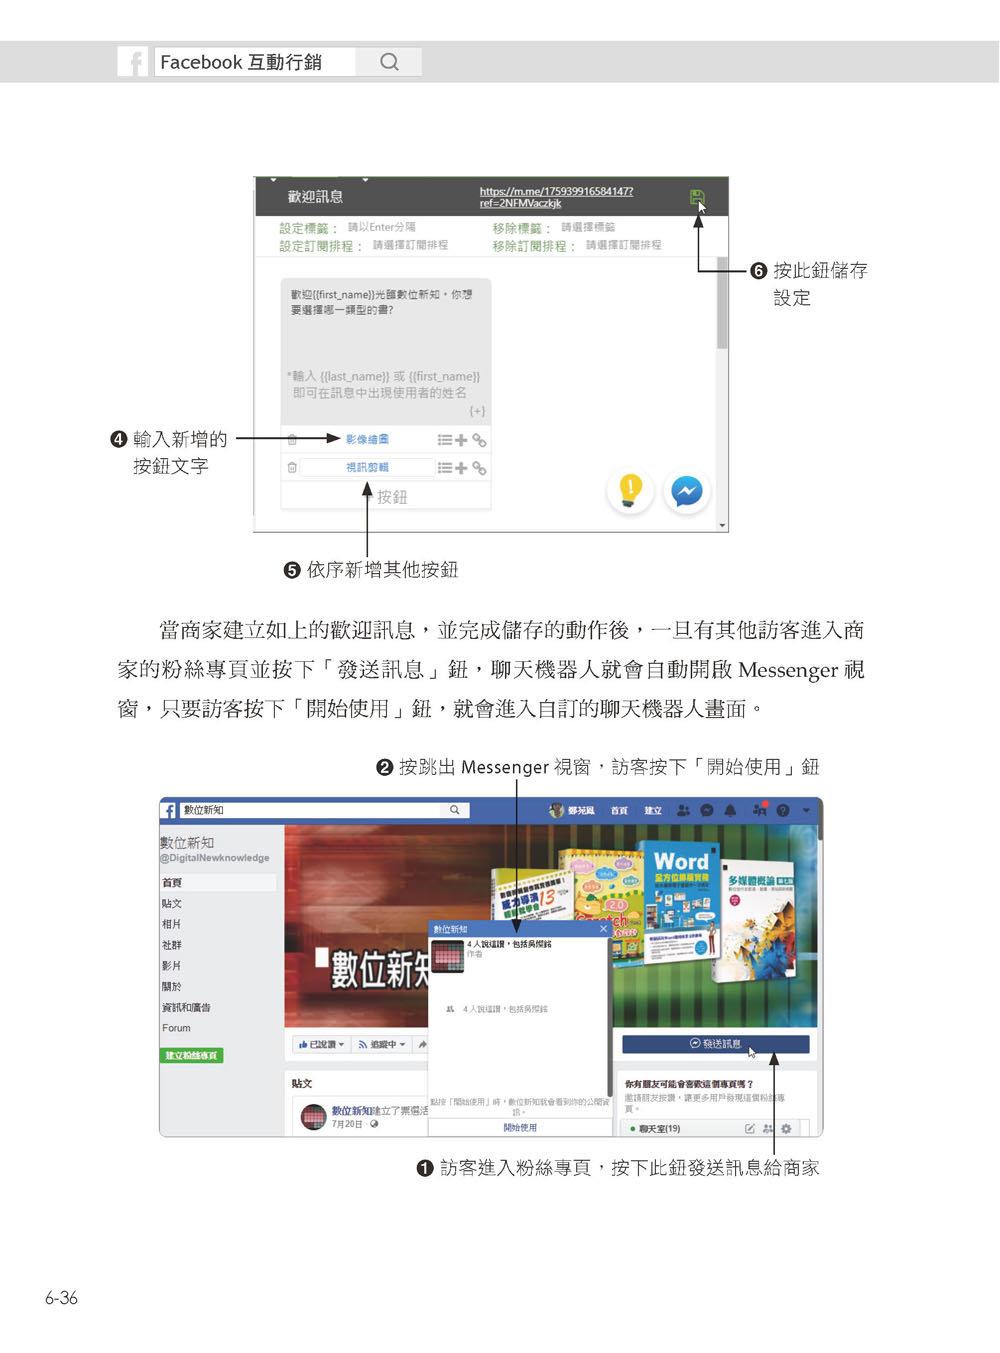 Facebook 互動行銷:社群口碑經營新思路+廣告投放如何有成效,想做好臉書行銷,操作心法就在這!-preview-55